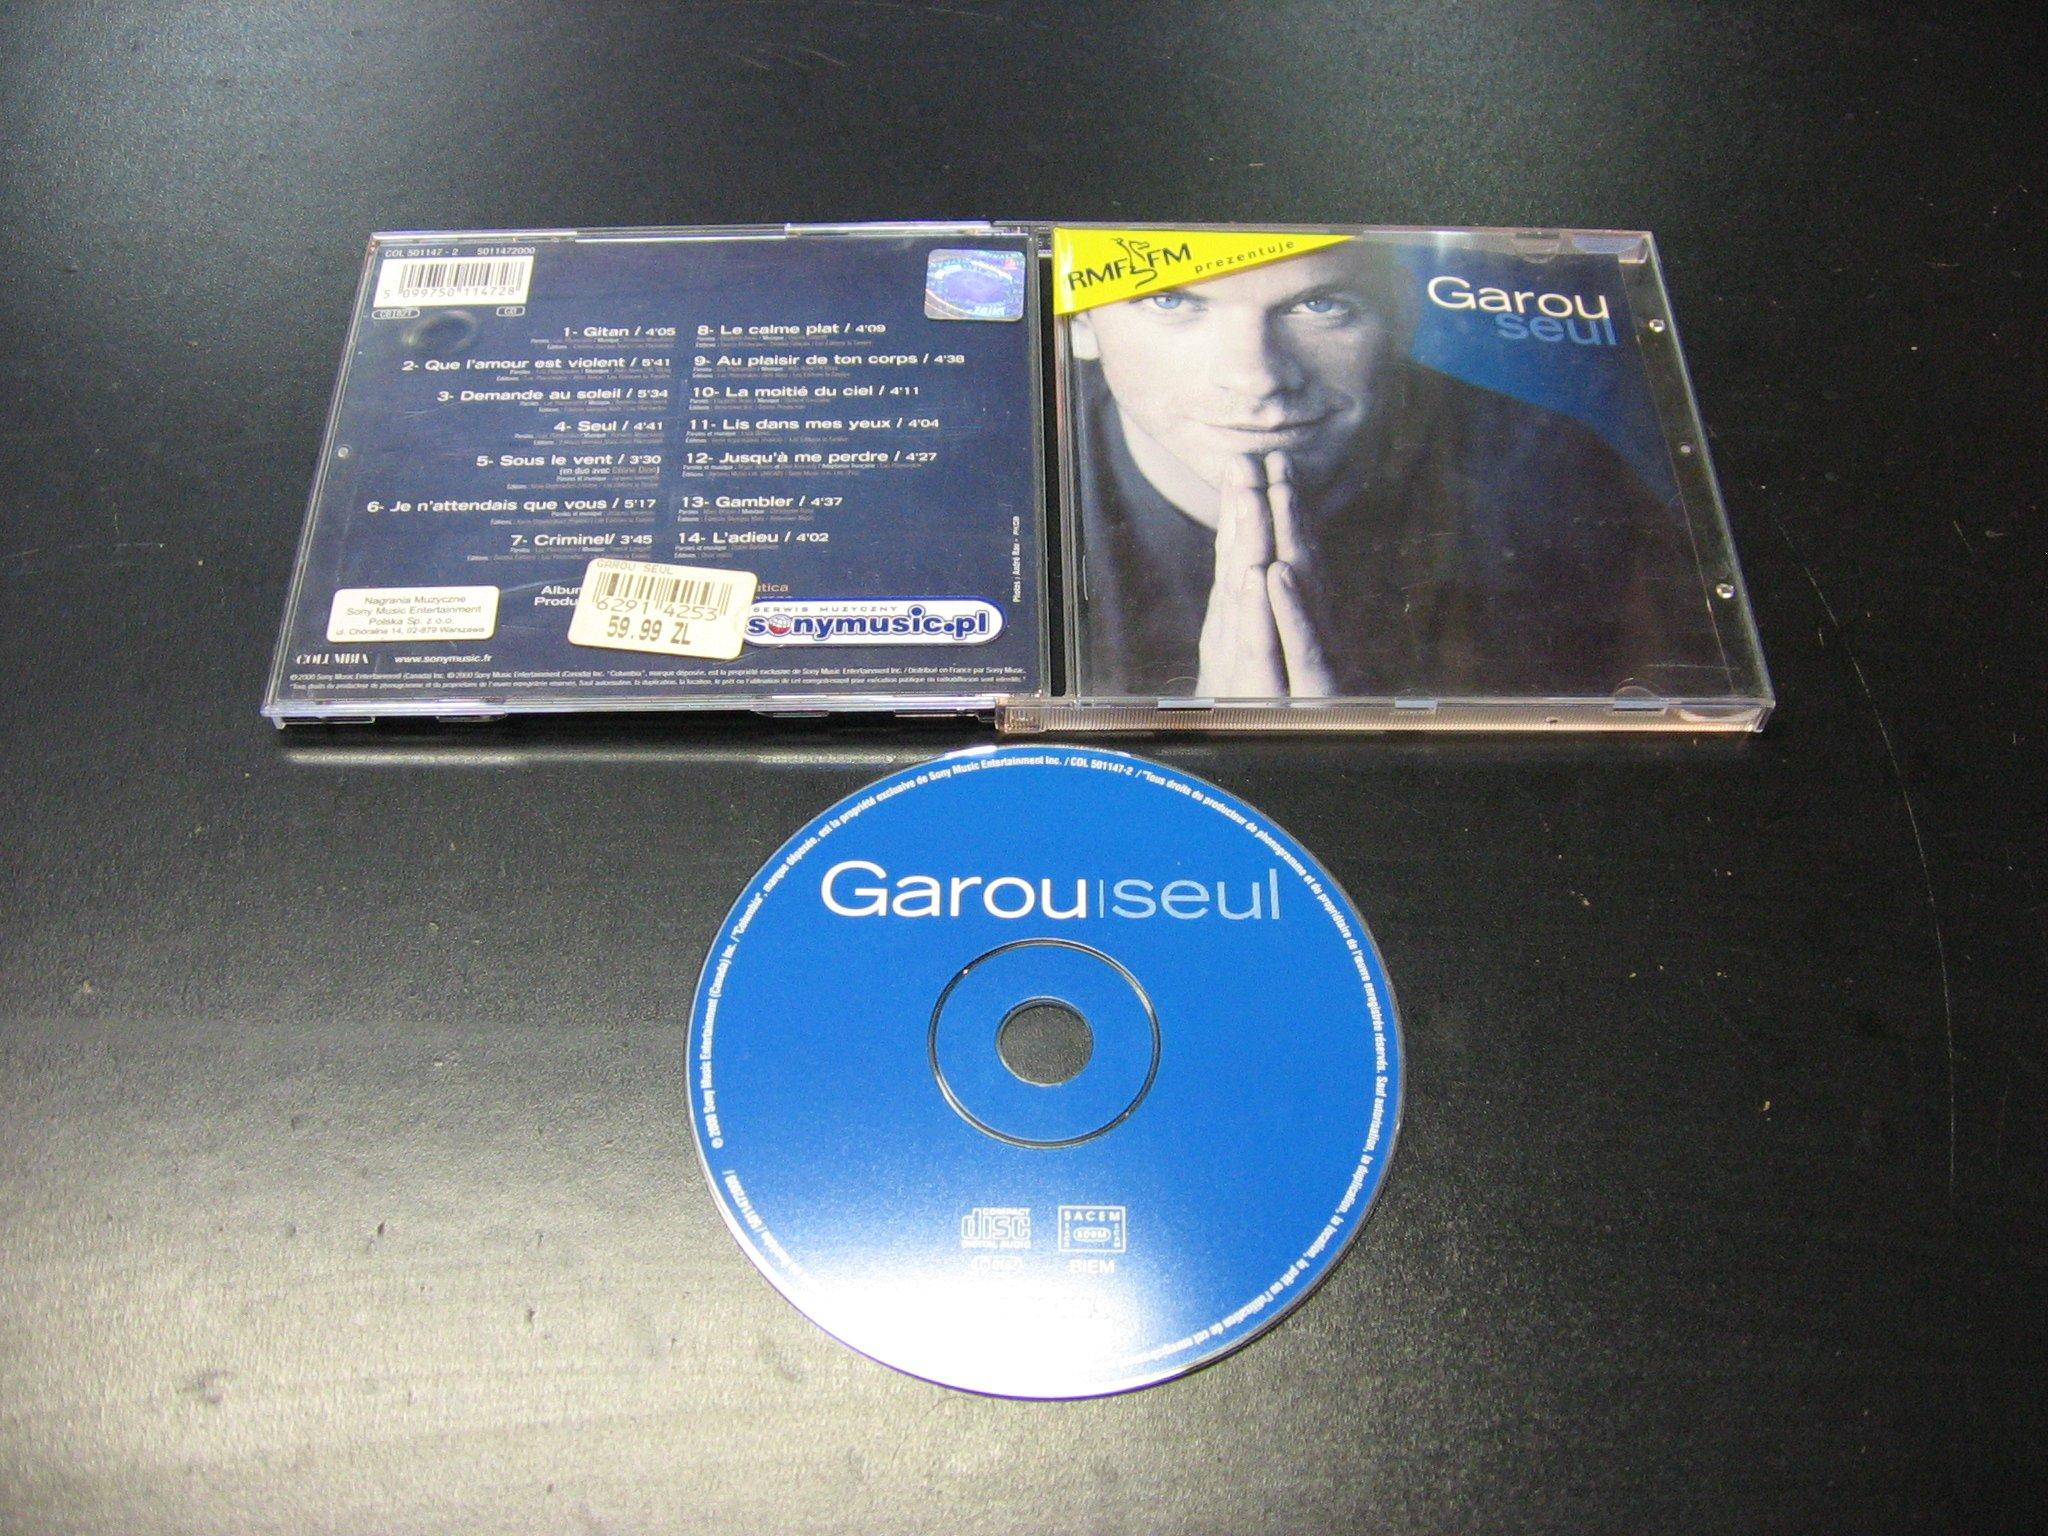 GAROU - SEUL CD FRANCUSKA MUZYKA  - Opole - AlleOpole.pl